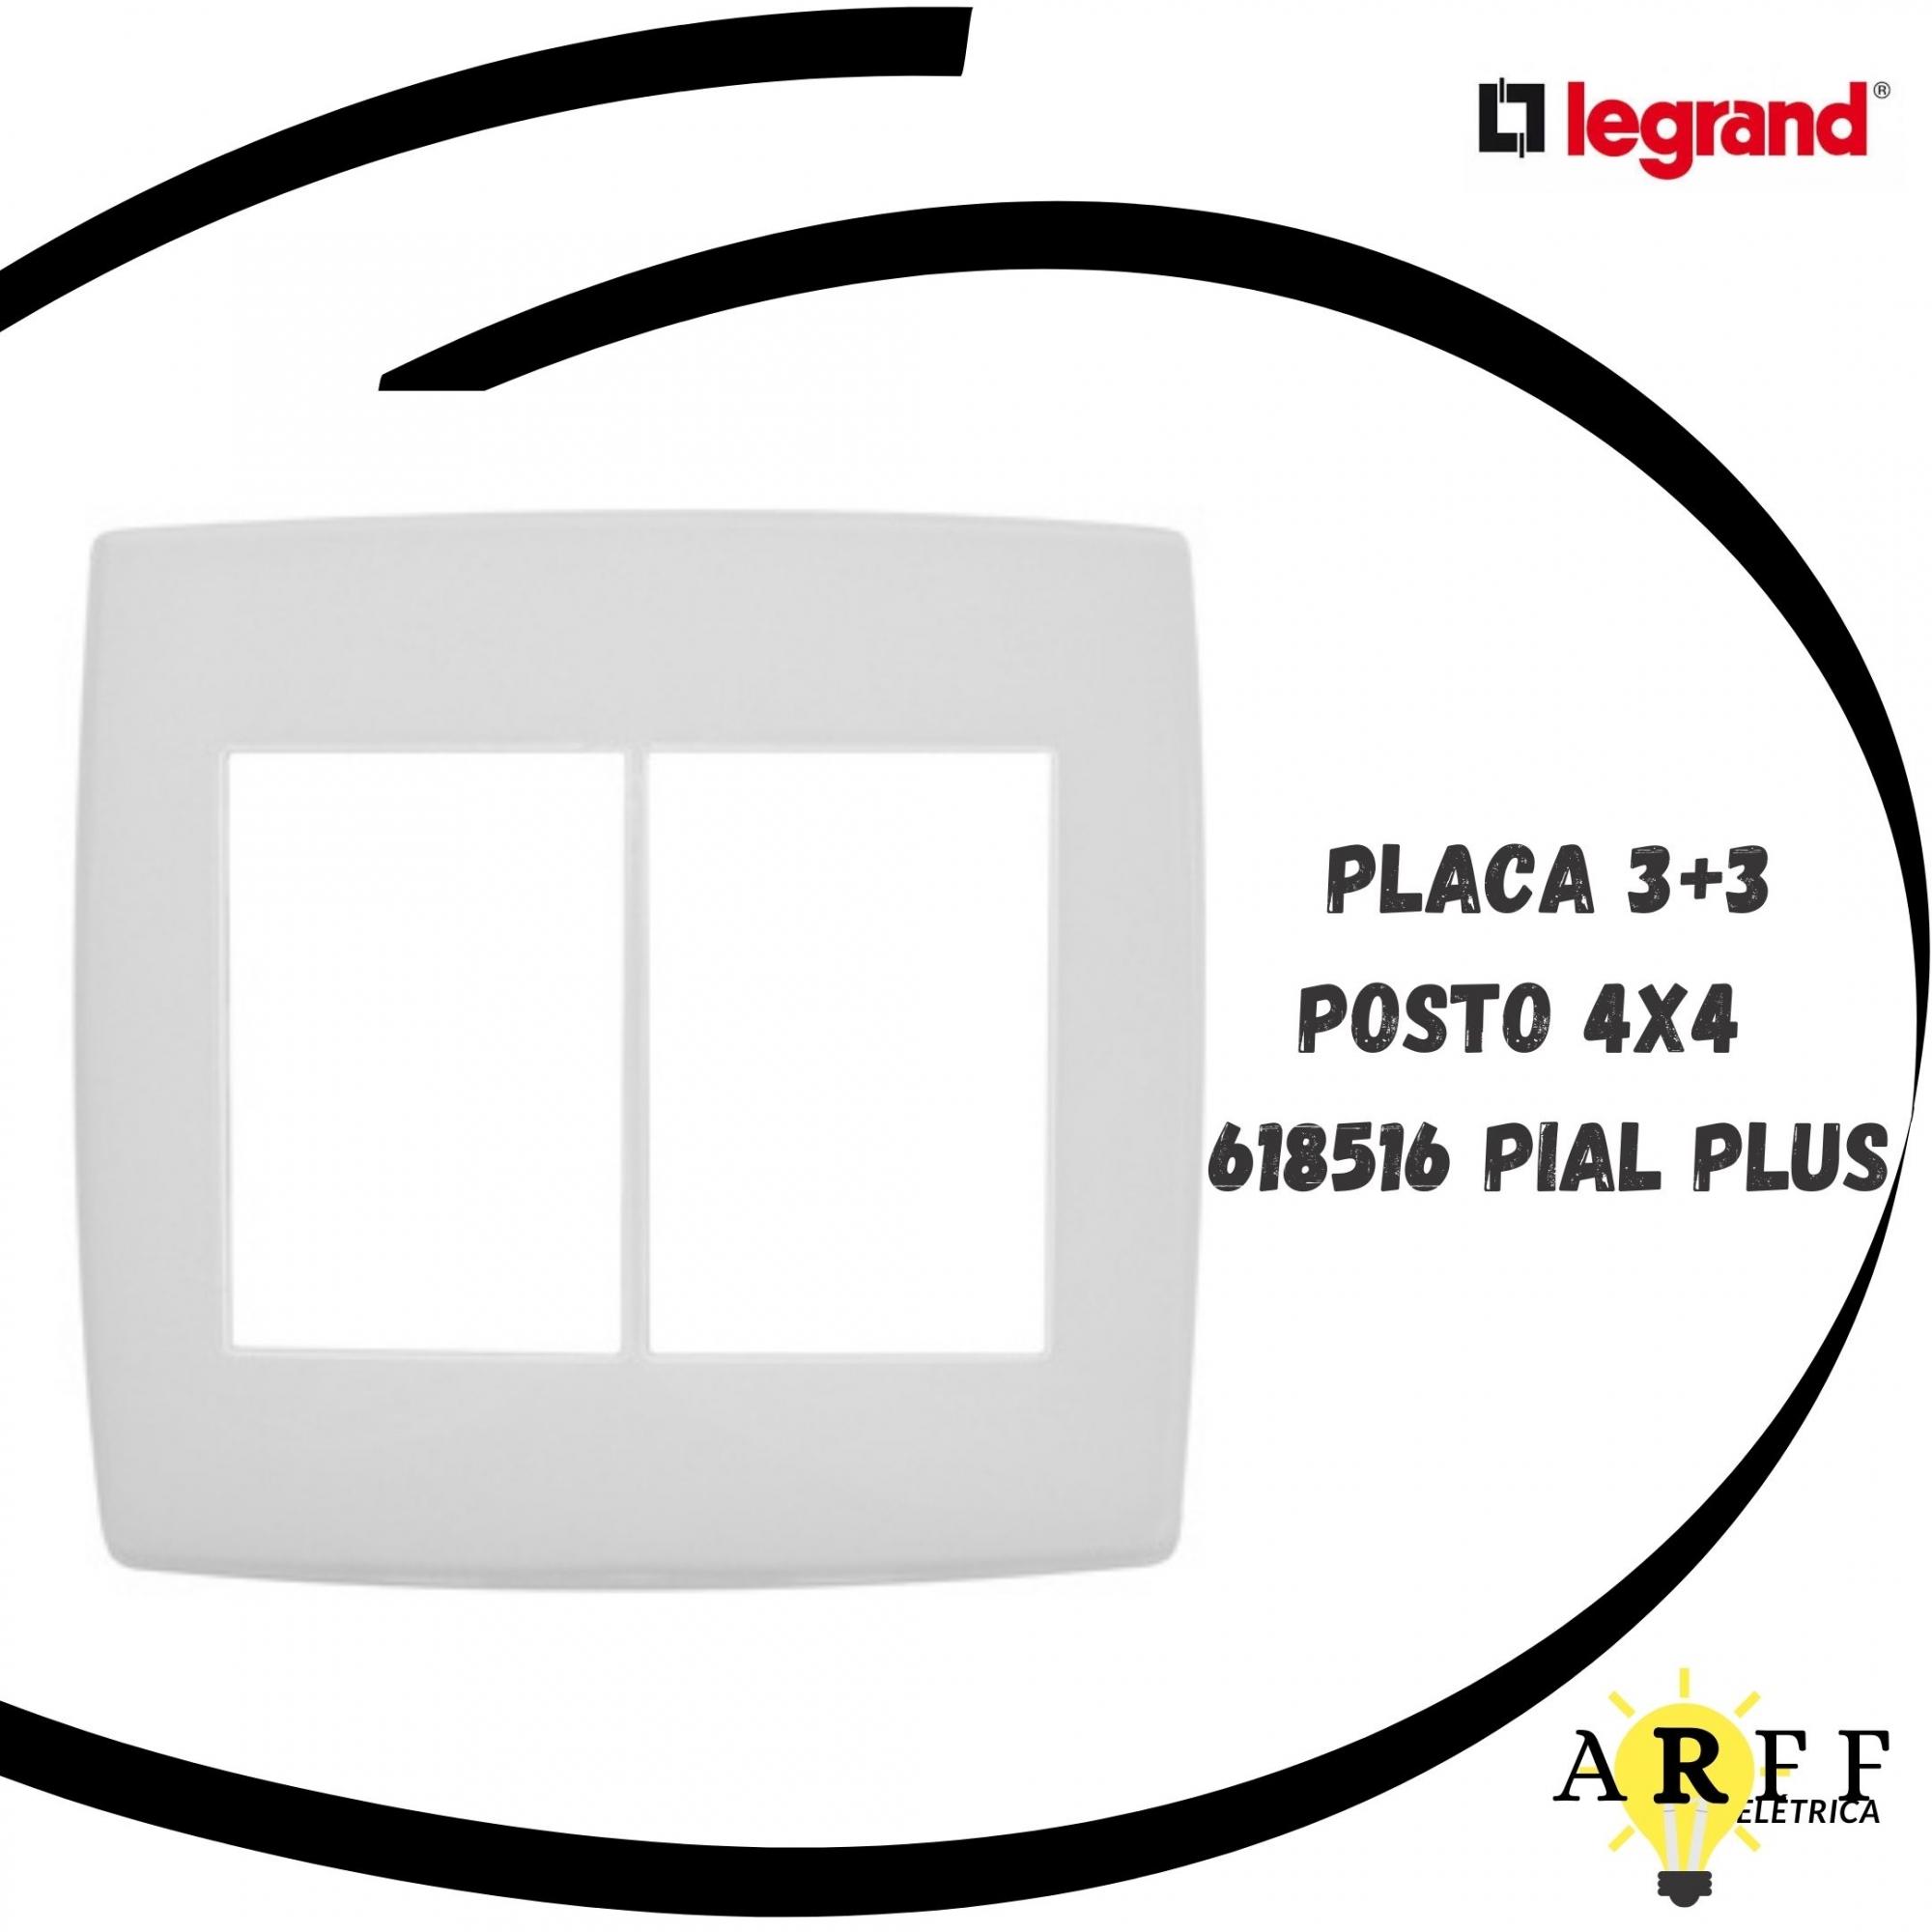 618516 Placa 3+3 Posto 4x4 PIAL PLUS LEGRAND